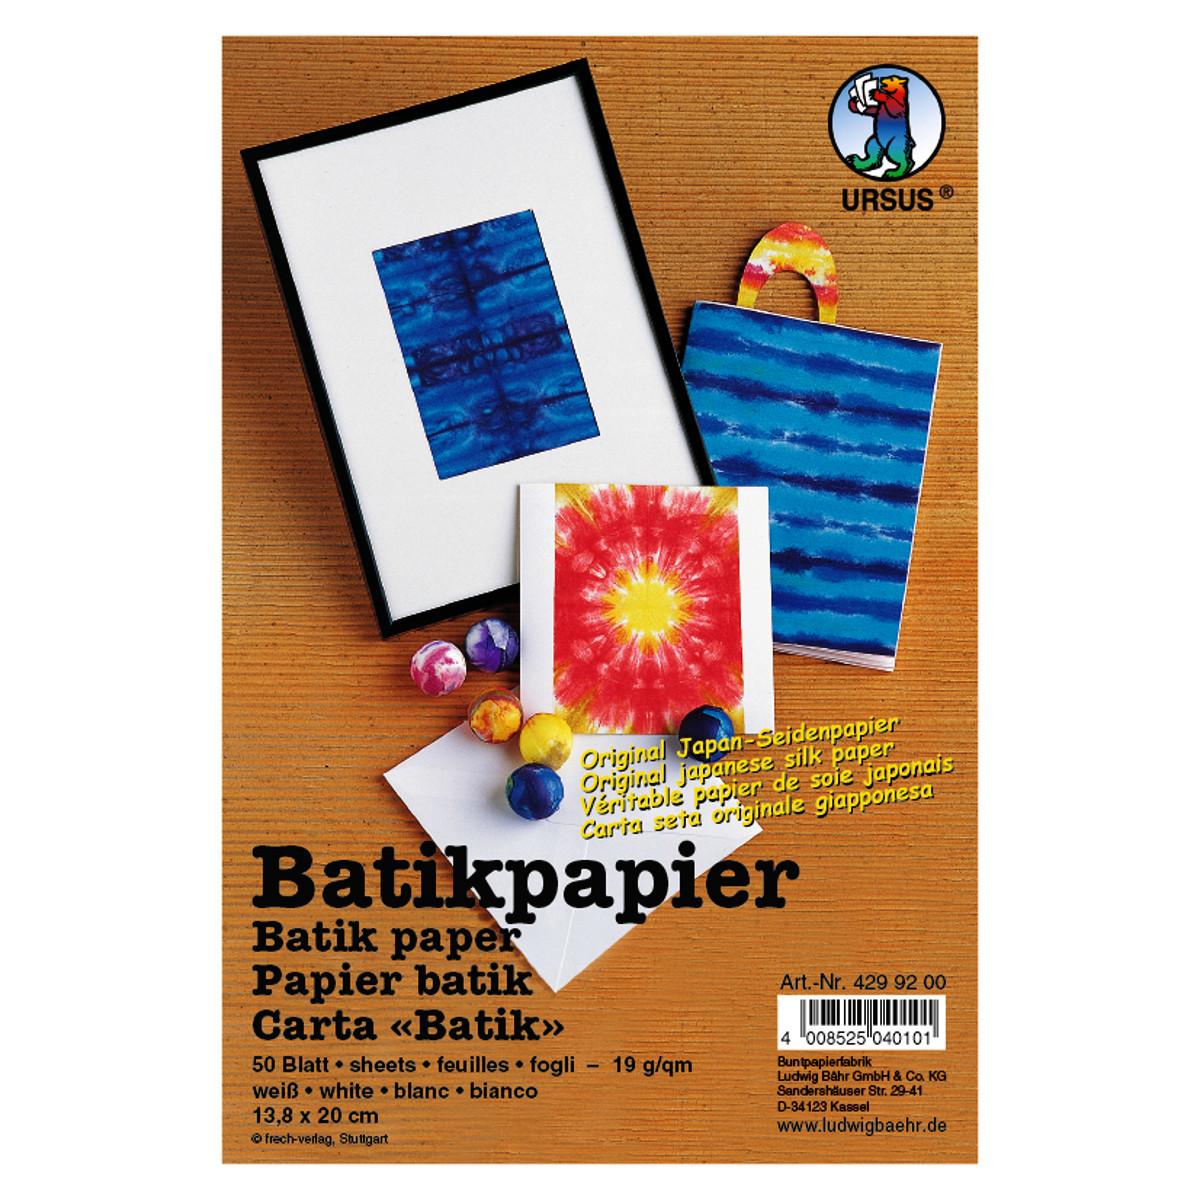 Batikpapier 19 g/qm 21 x 29,7 cm - 50 Blatt